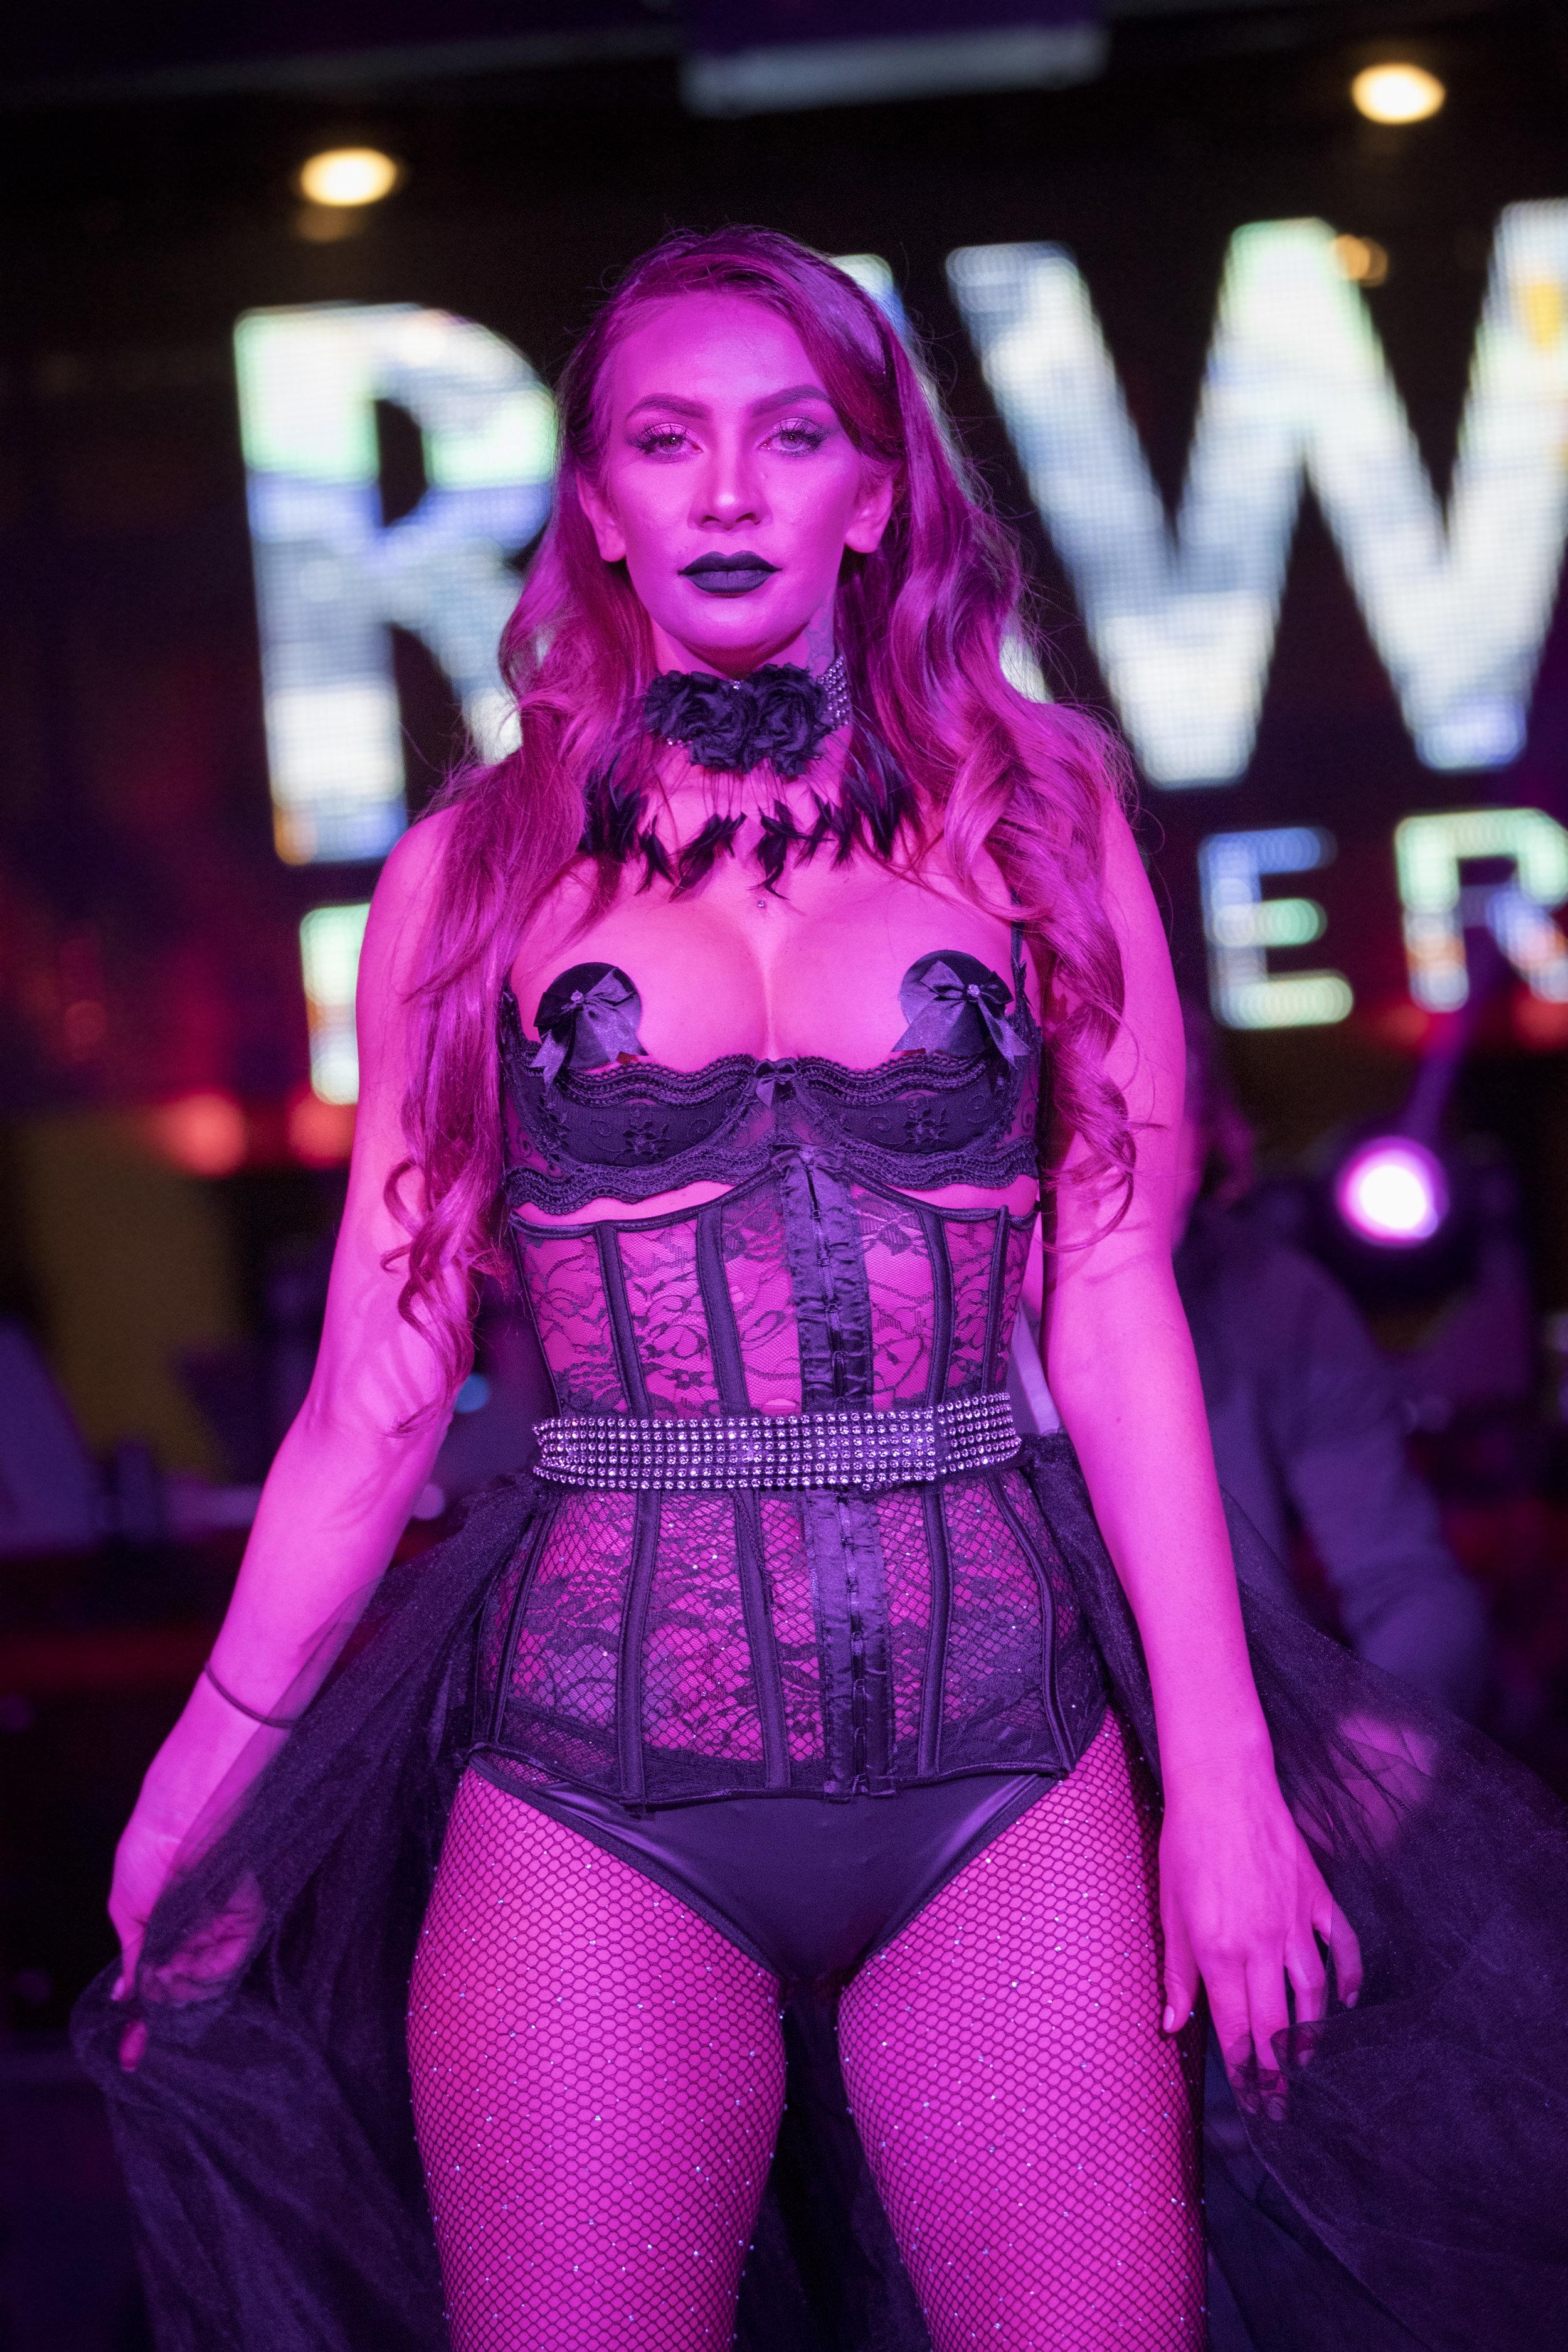 RAW SAVOR - Femme Fatele - 020.jpg